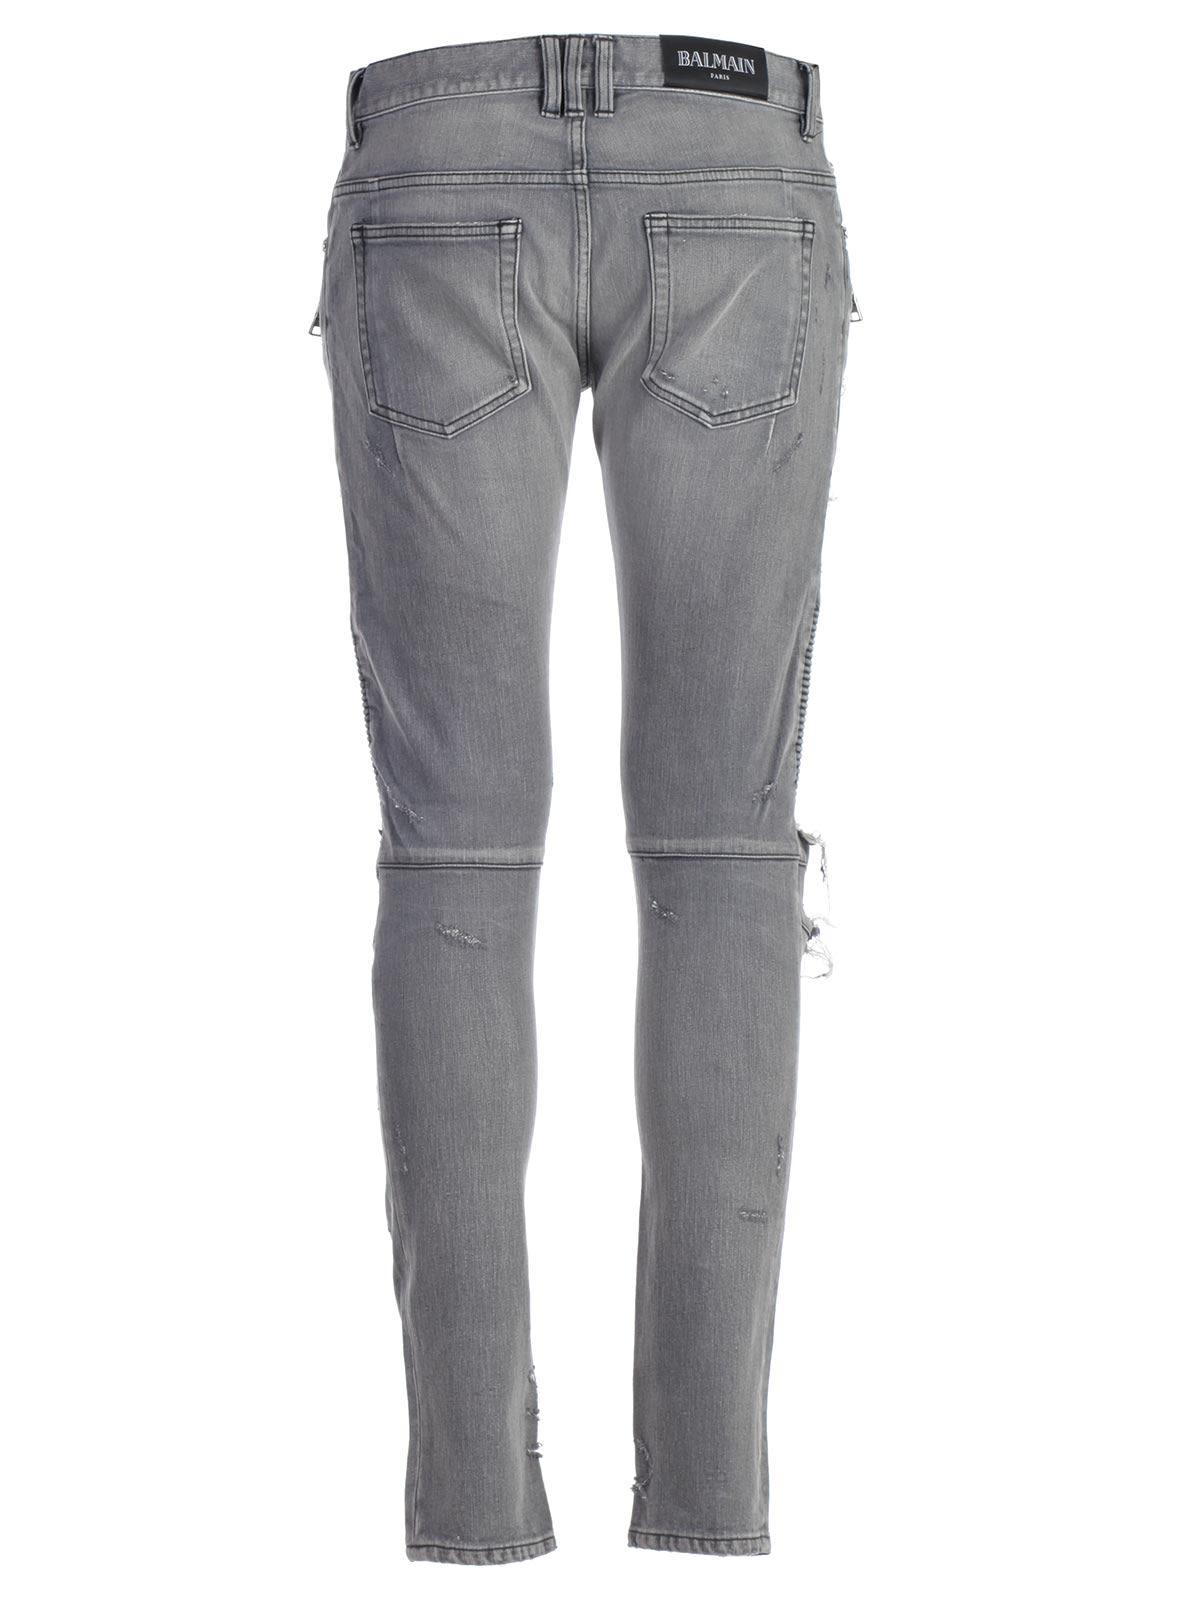 43592cd96bd Balmain Balmain Skinny Biker Distressed Zipped Jeans - Opa Black ...